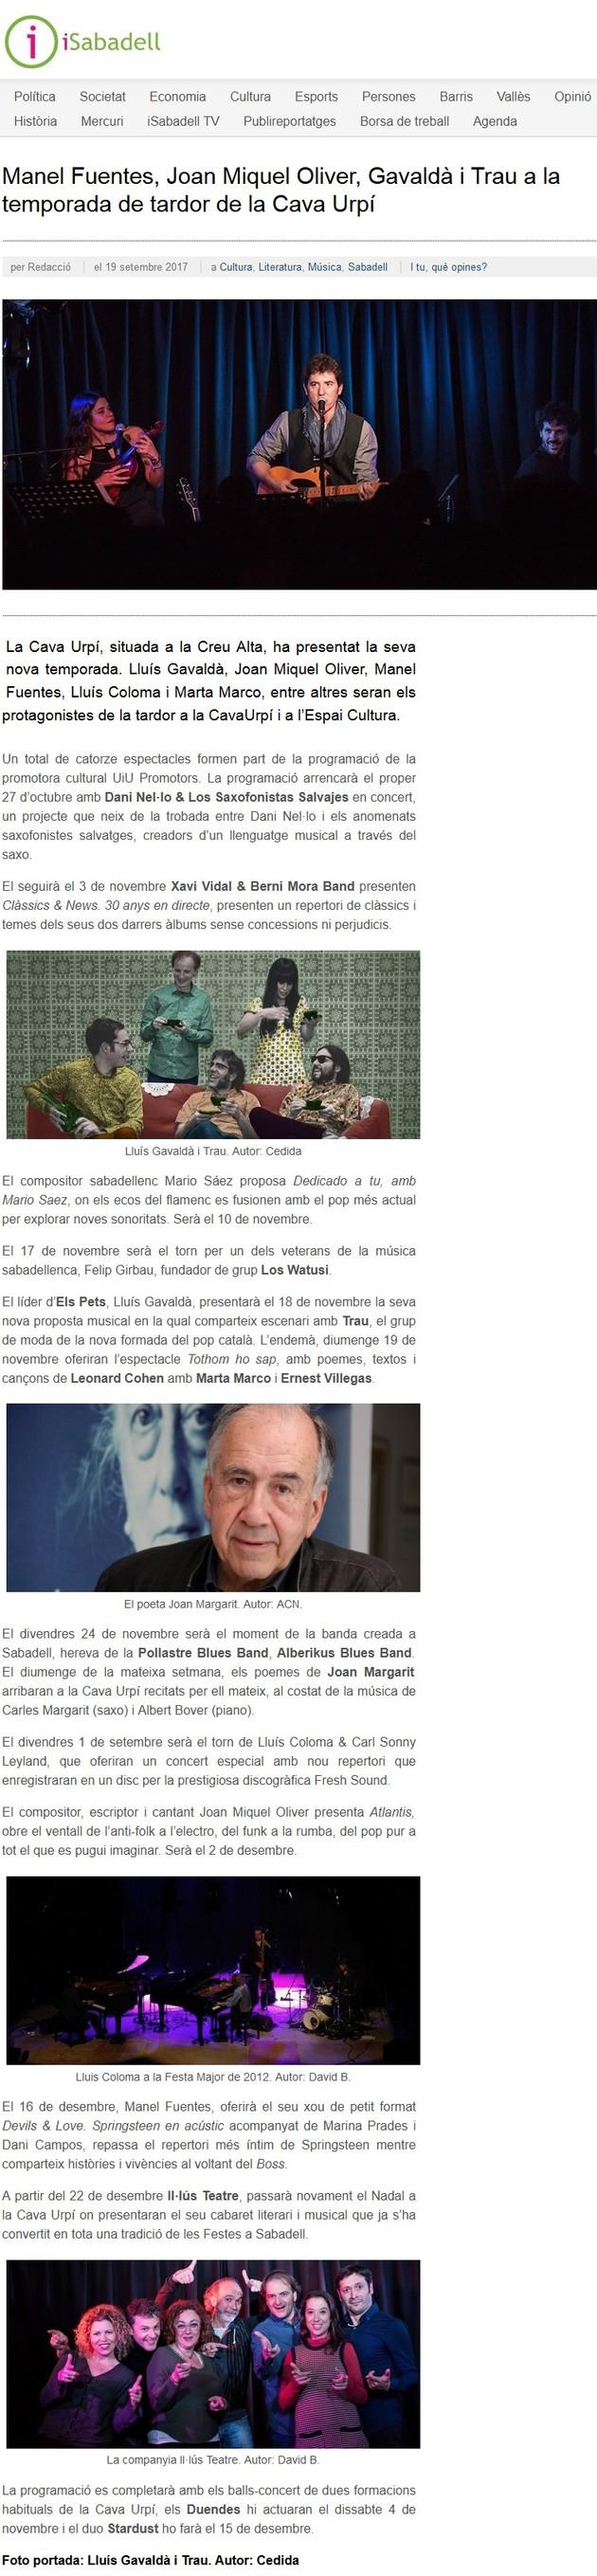 iSabadell: Manel Fuentes, Joan Miquel Oliver, Gavaldà i Trau a la temporada de tardor de la Cava Urpí